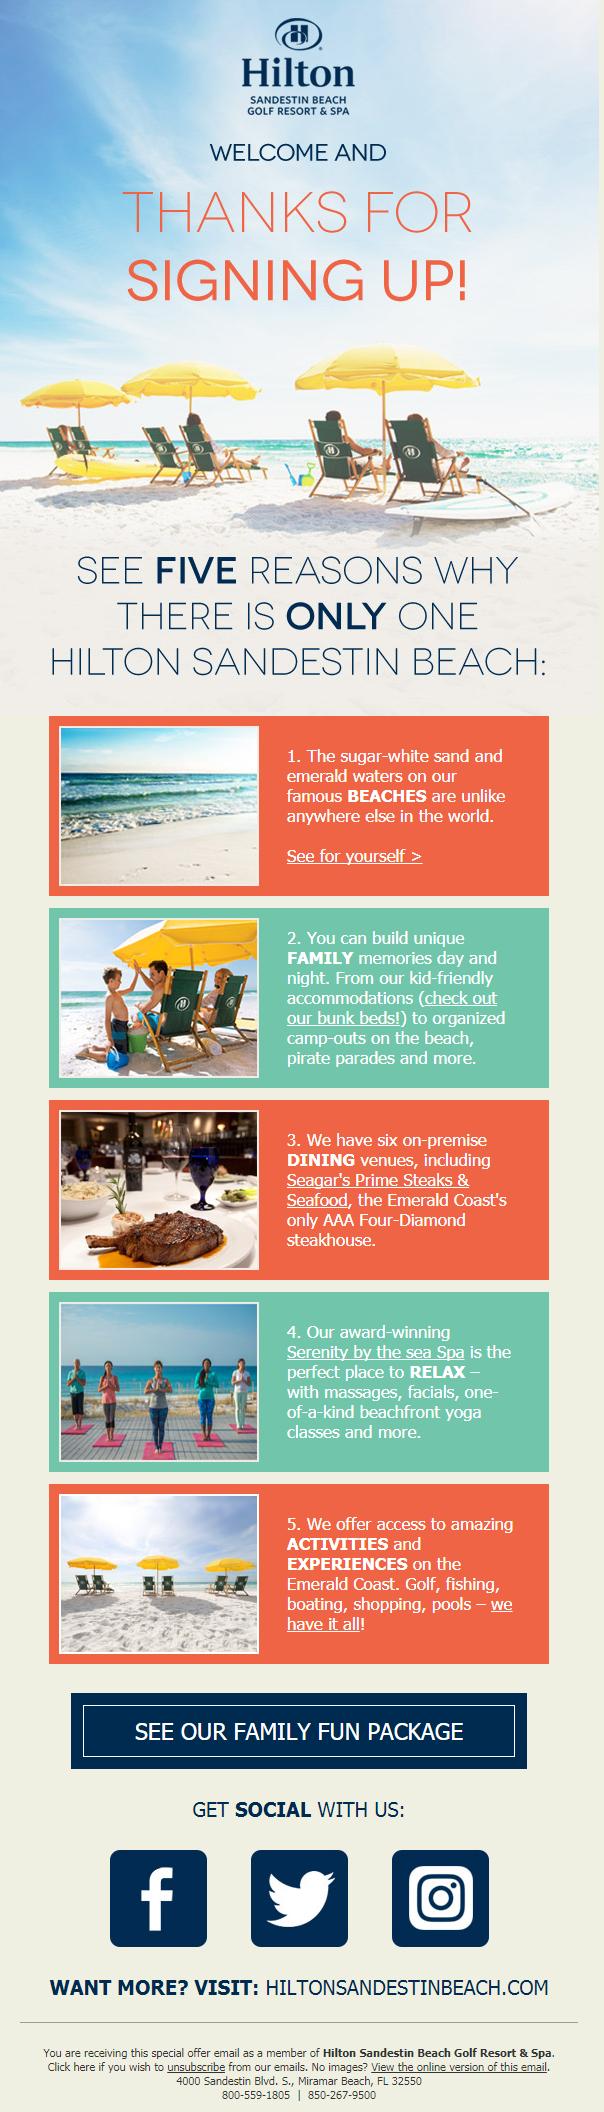 Hilton Sandestin Beach Golf Resort & Spa Welcome Email Series